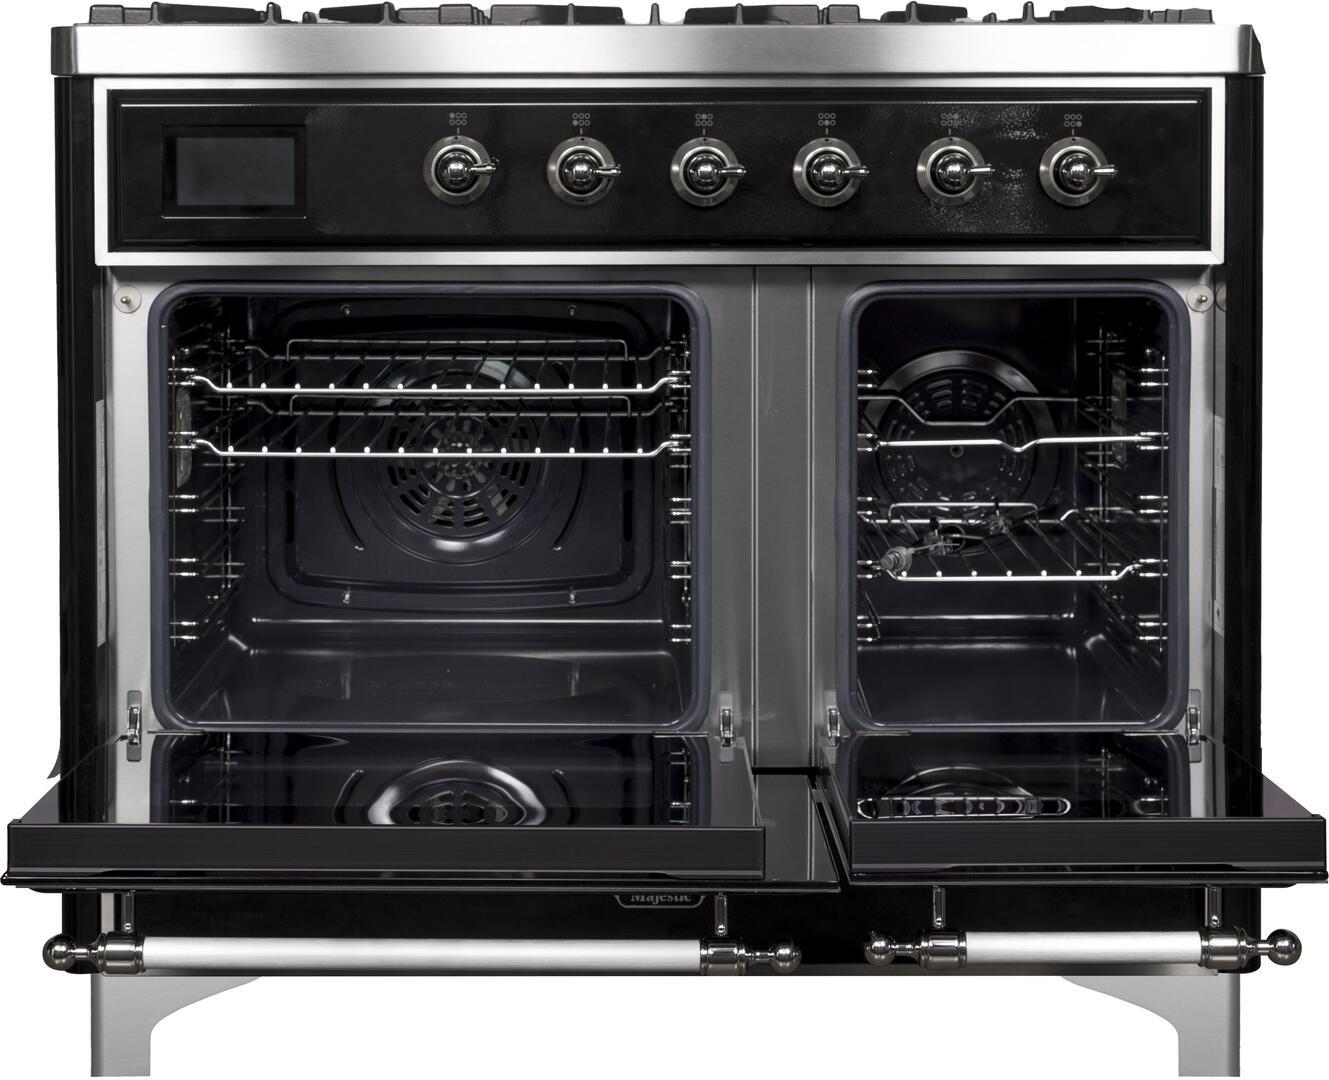 Ilve Majestic II UMD10FDNS3BKC Freestanding Dual Fuel Range Black, UMD10FDNS3BKC Oven Doors Opened